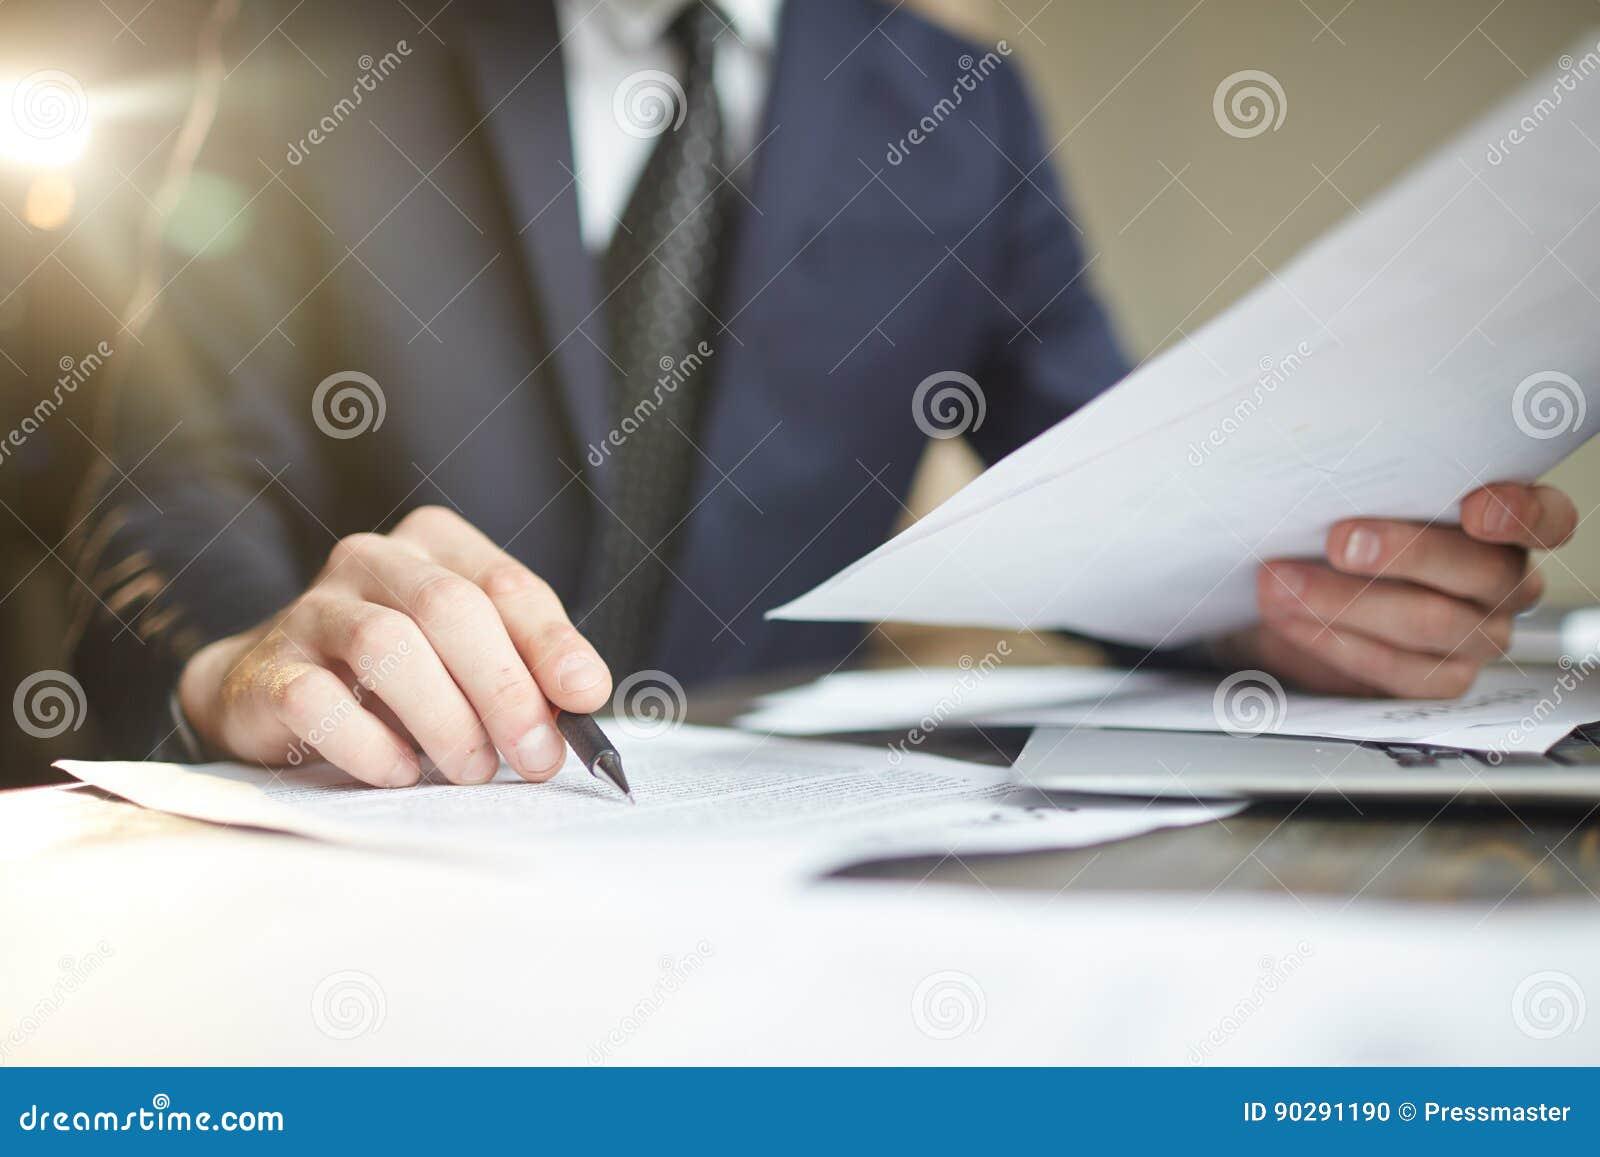 Hombre de negocios Reviewing Paperwork Closeup